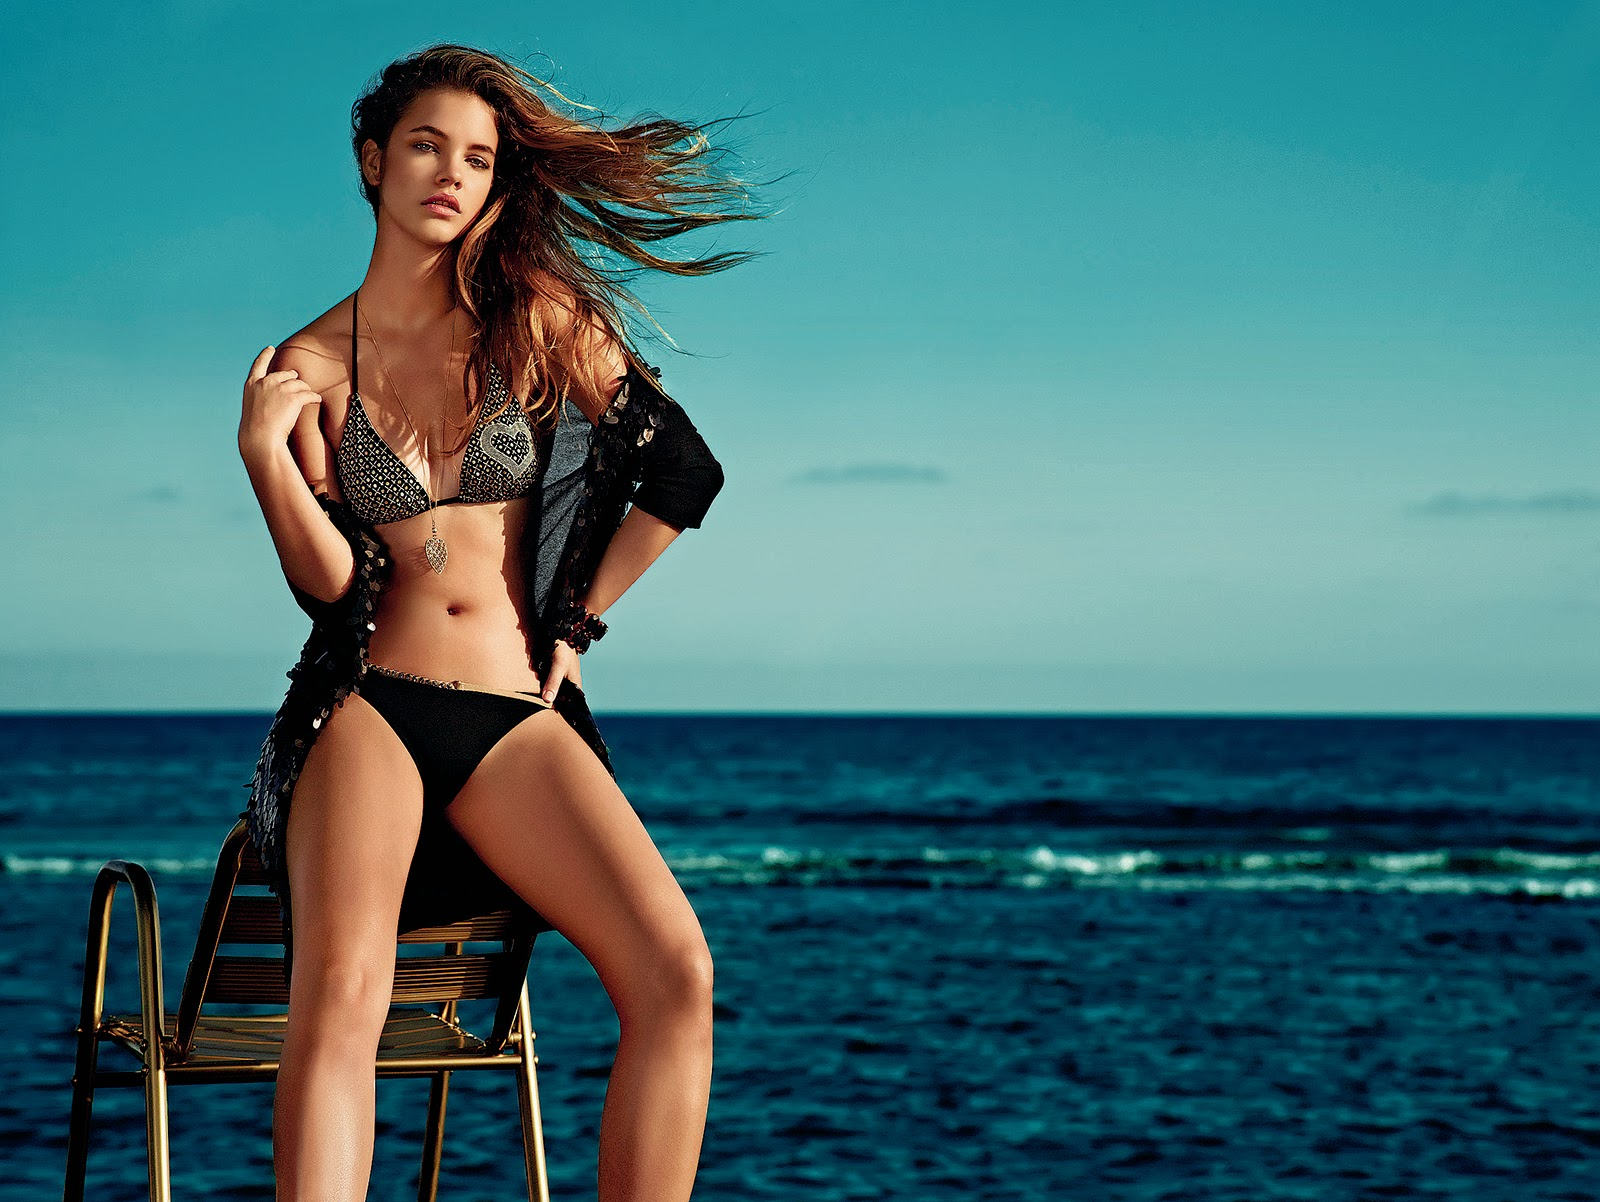 elysian glam supermodel barbara palvin twin set beachwear. Black Bedroom Furniture Sets. Home Design Ideas